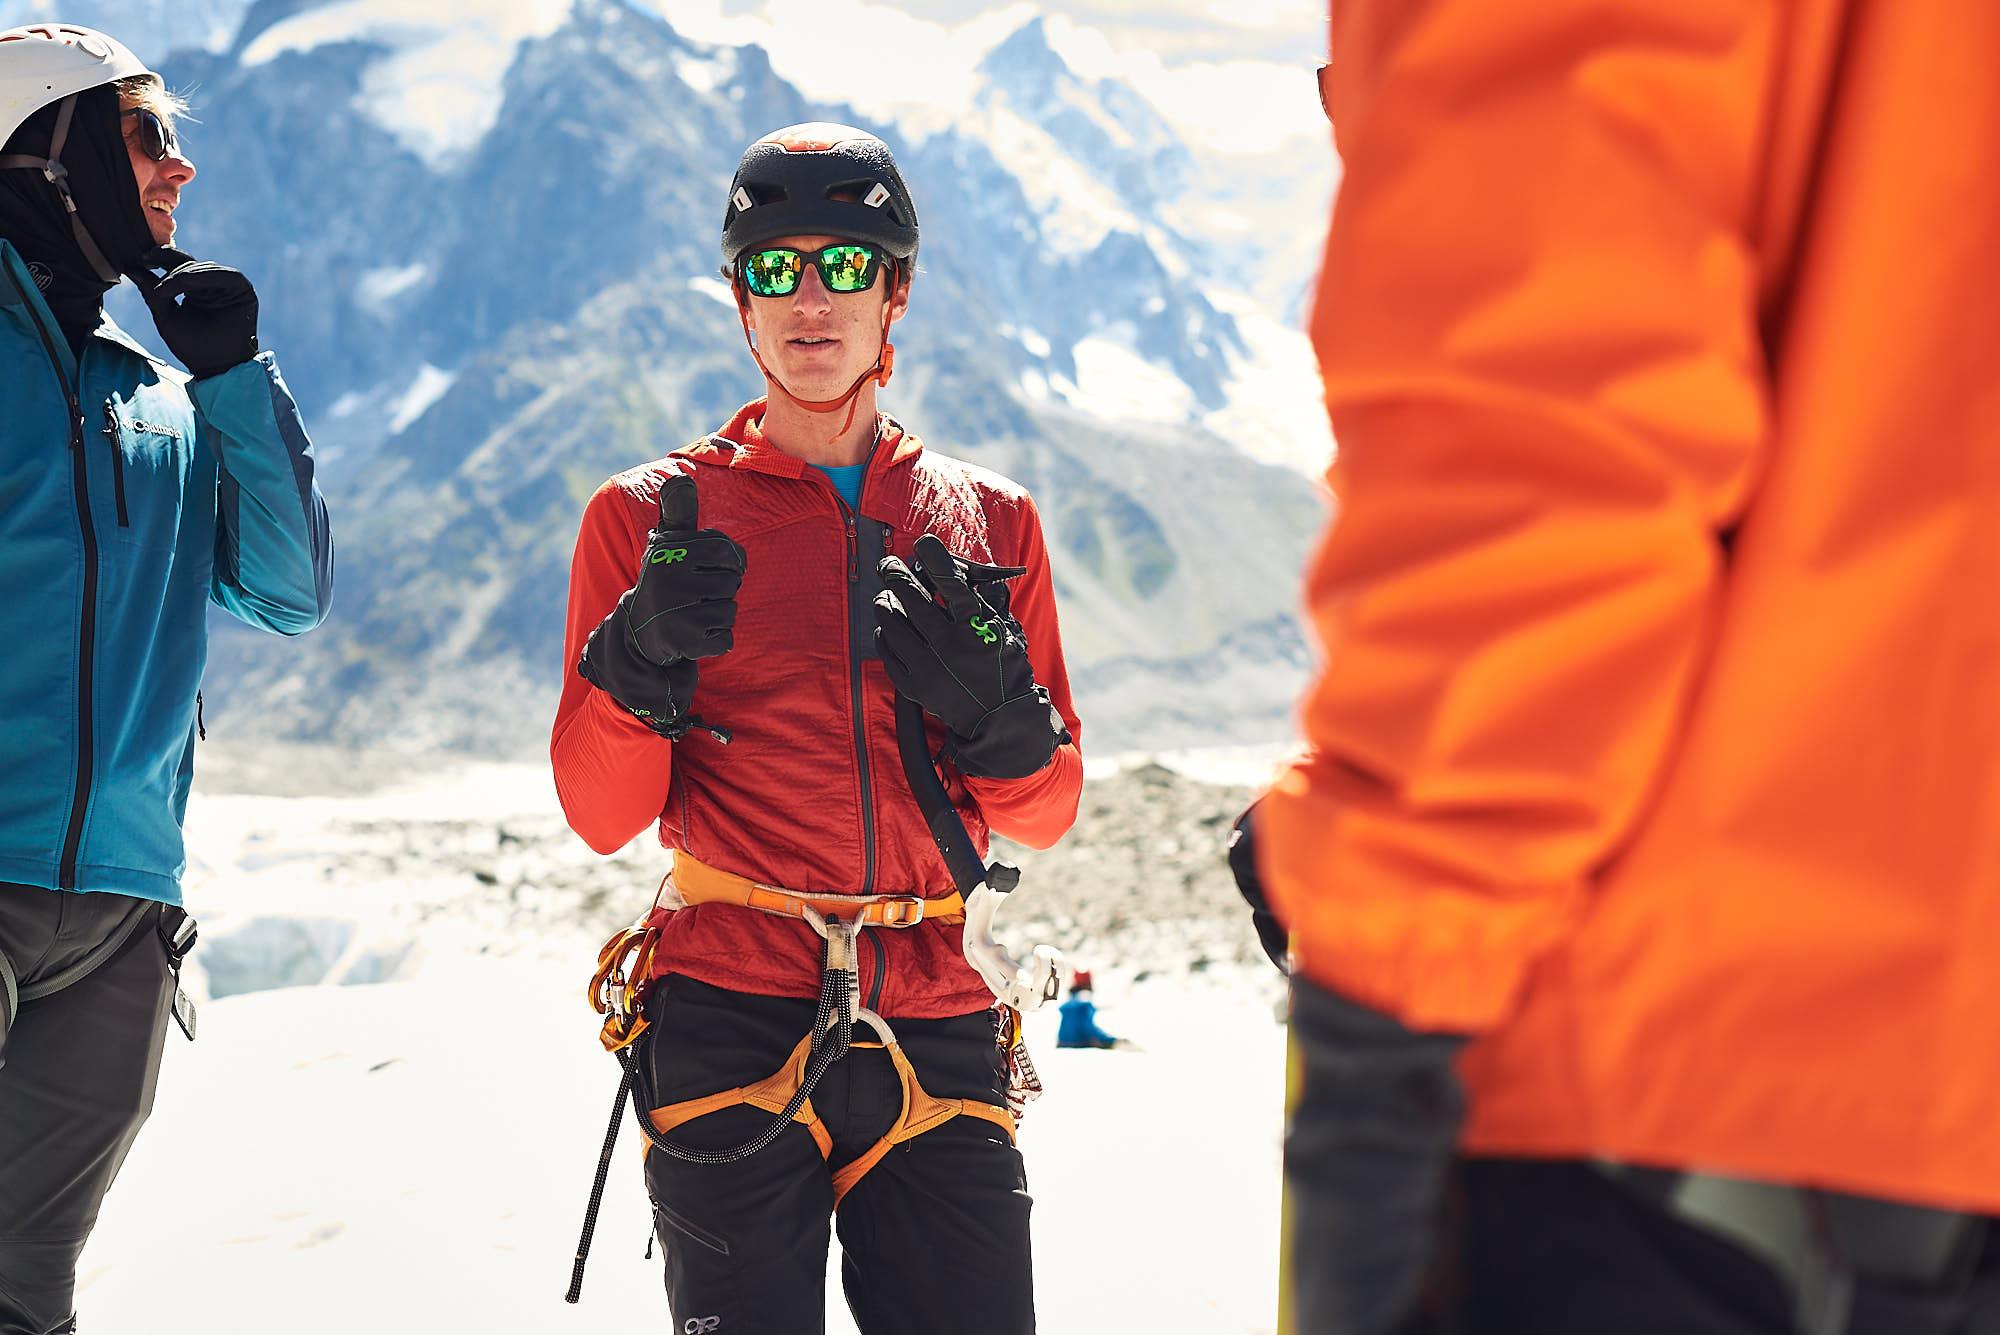 Mountain guide explaining some techniques on the Mer de Glace glacier